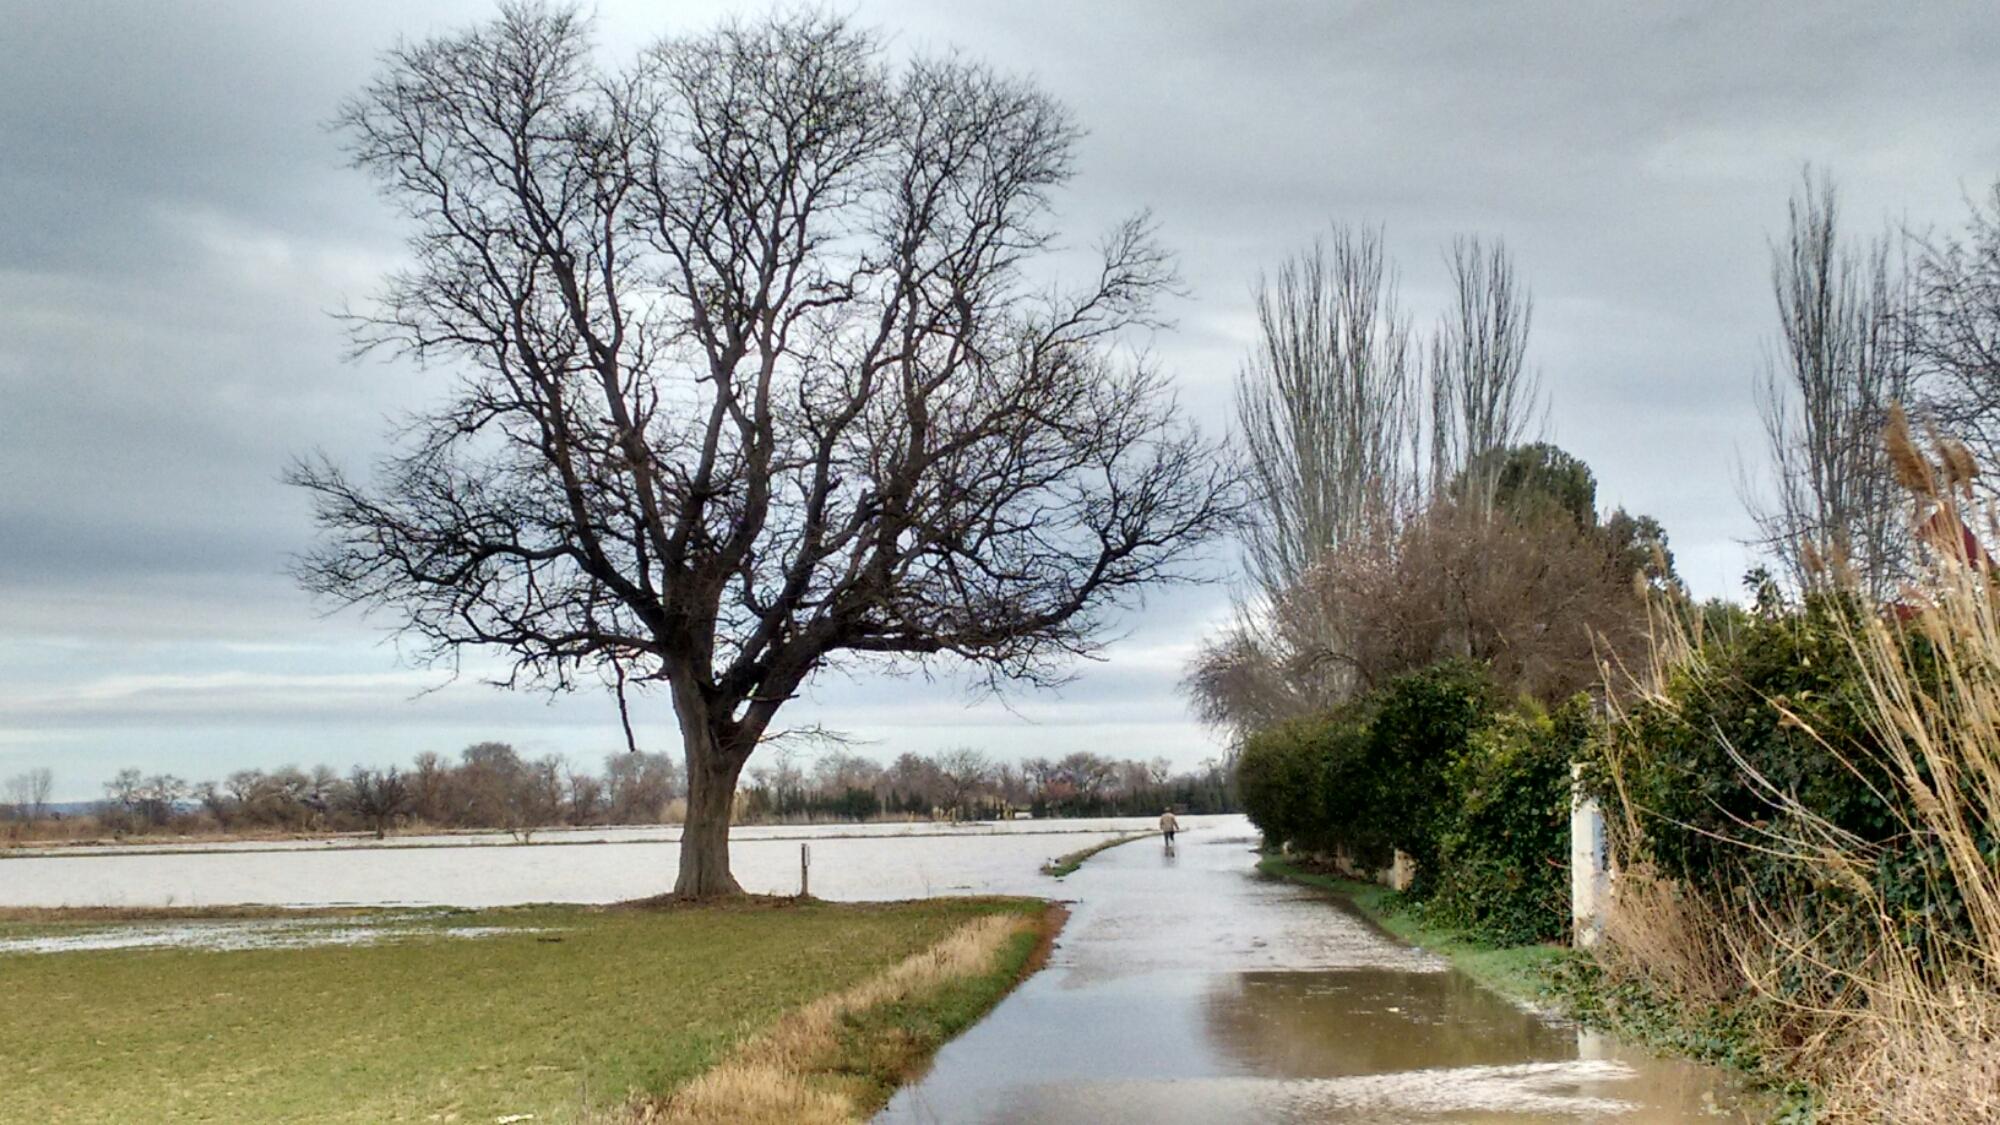 Camino de Zaragoza a Monzalbarba 28 Feb 2015